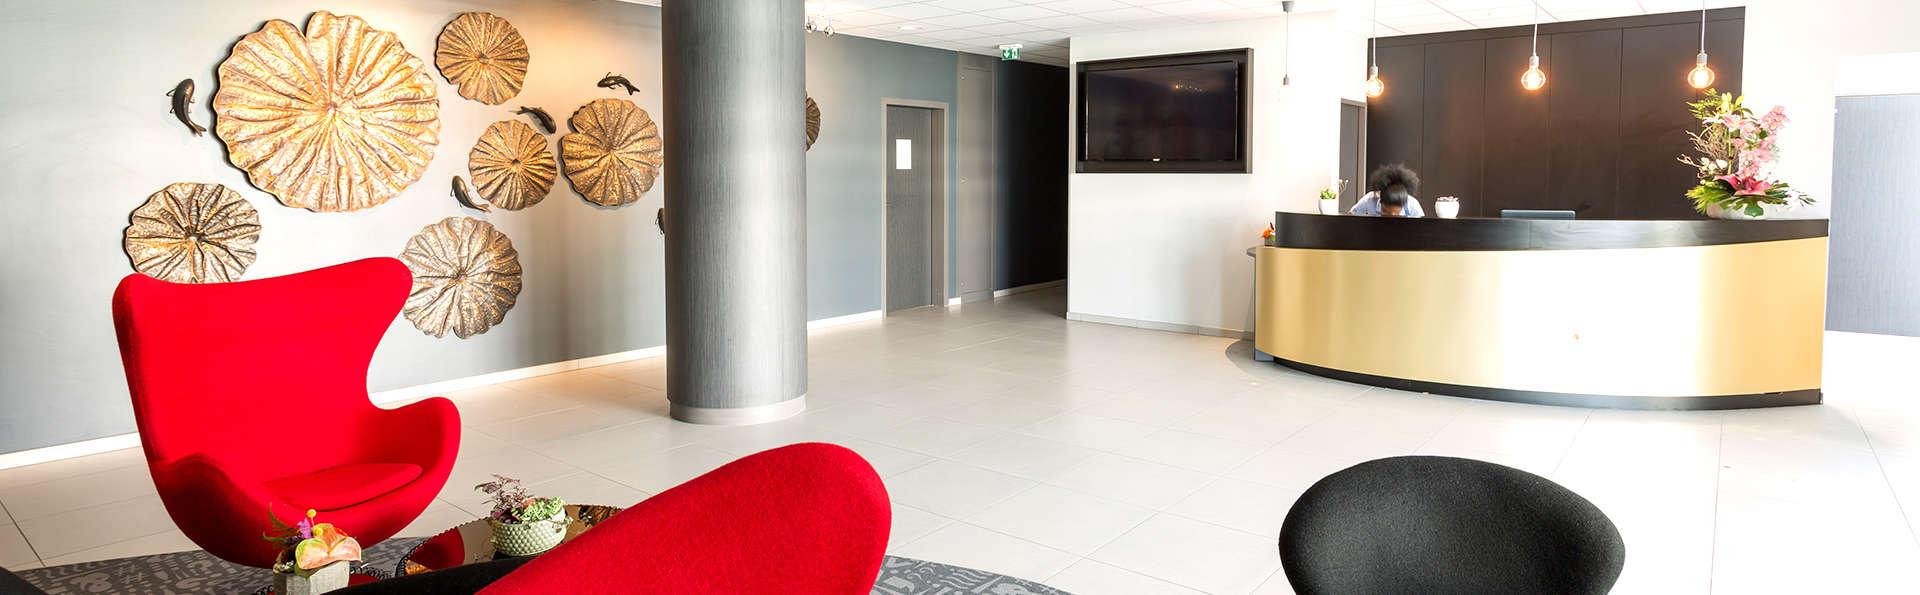 Nemea Appart'hotel Résidence le Stadium - EDIT_NEW_RECEPTION.jpg